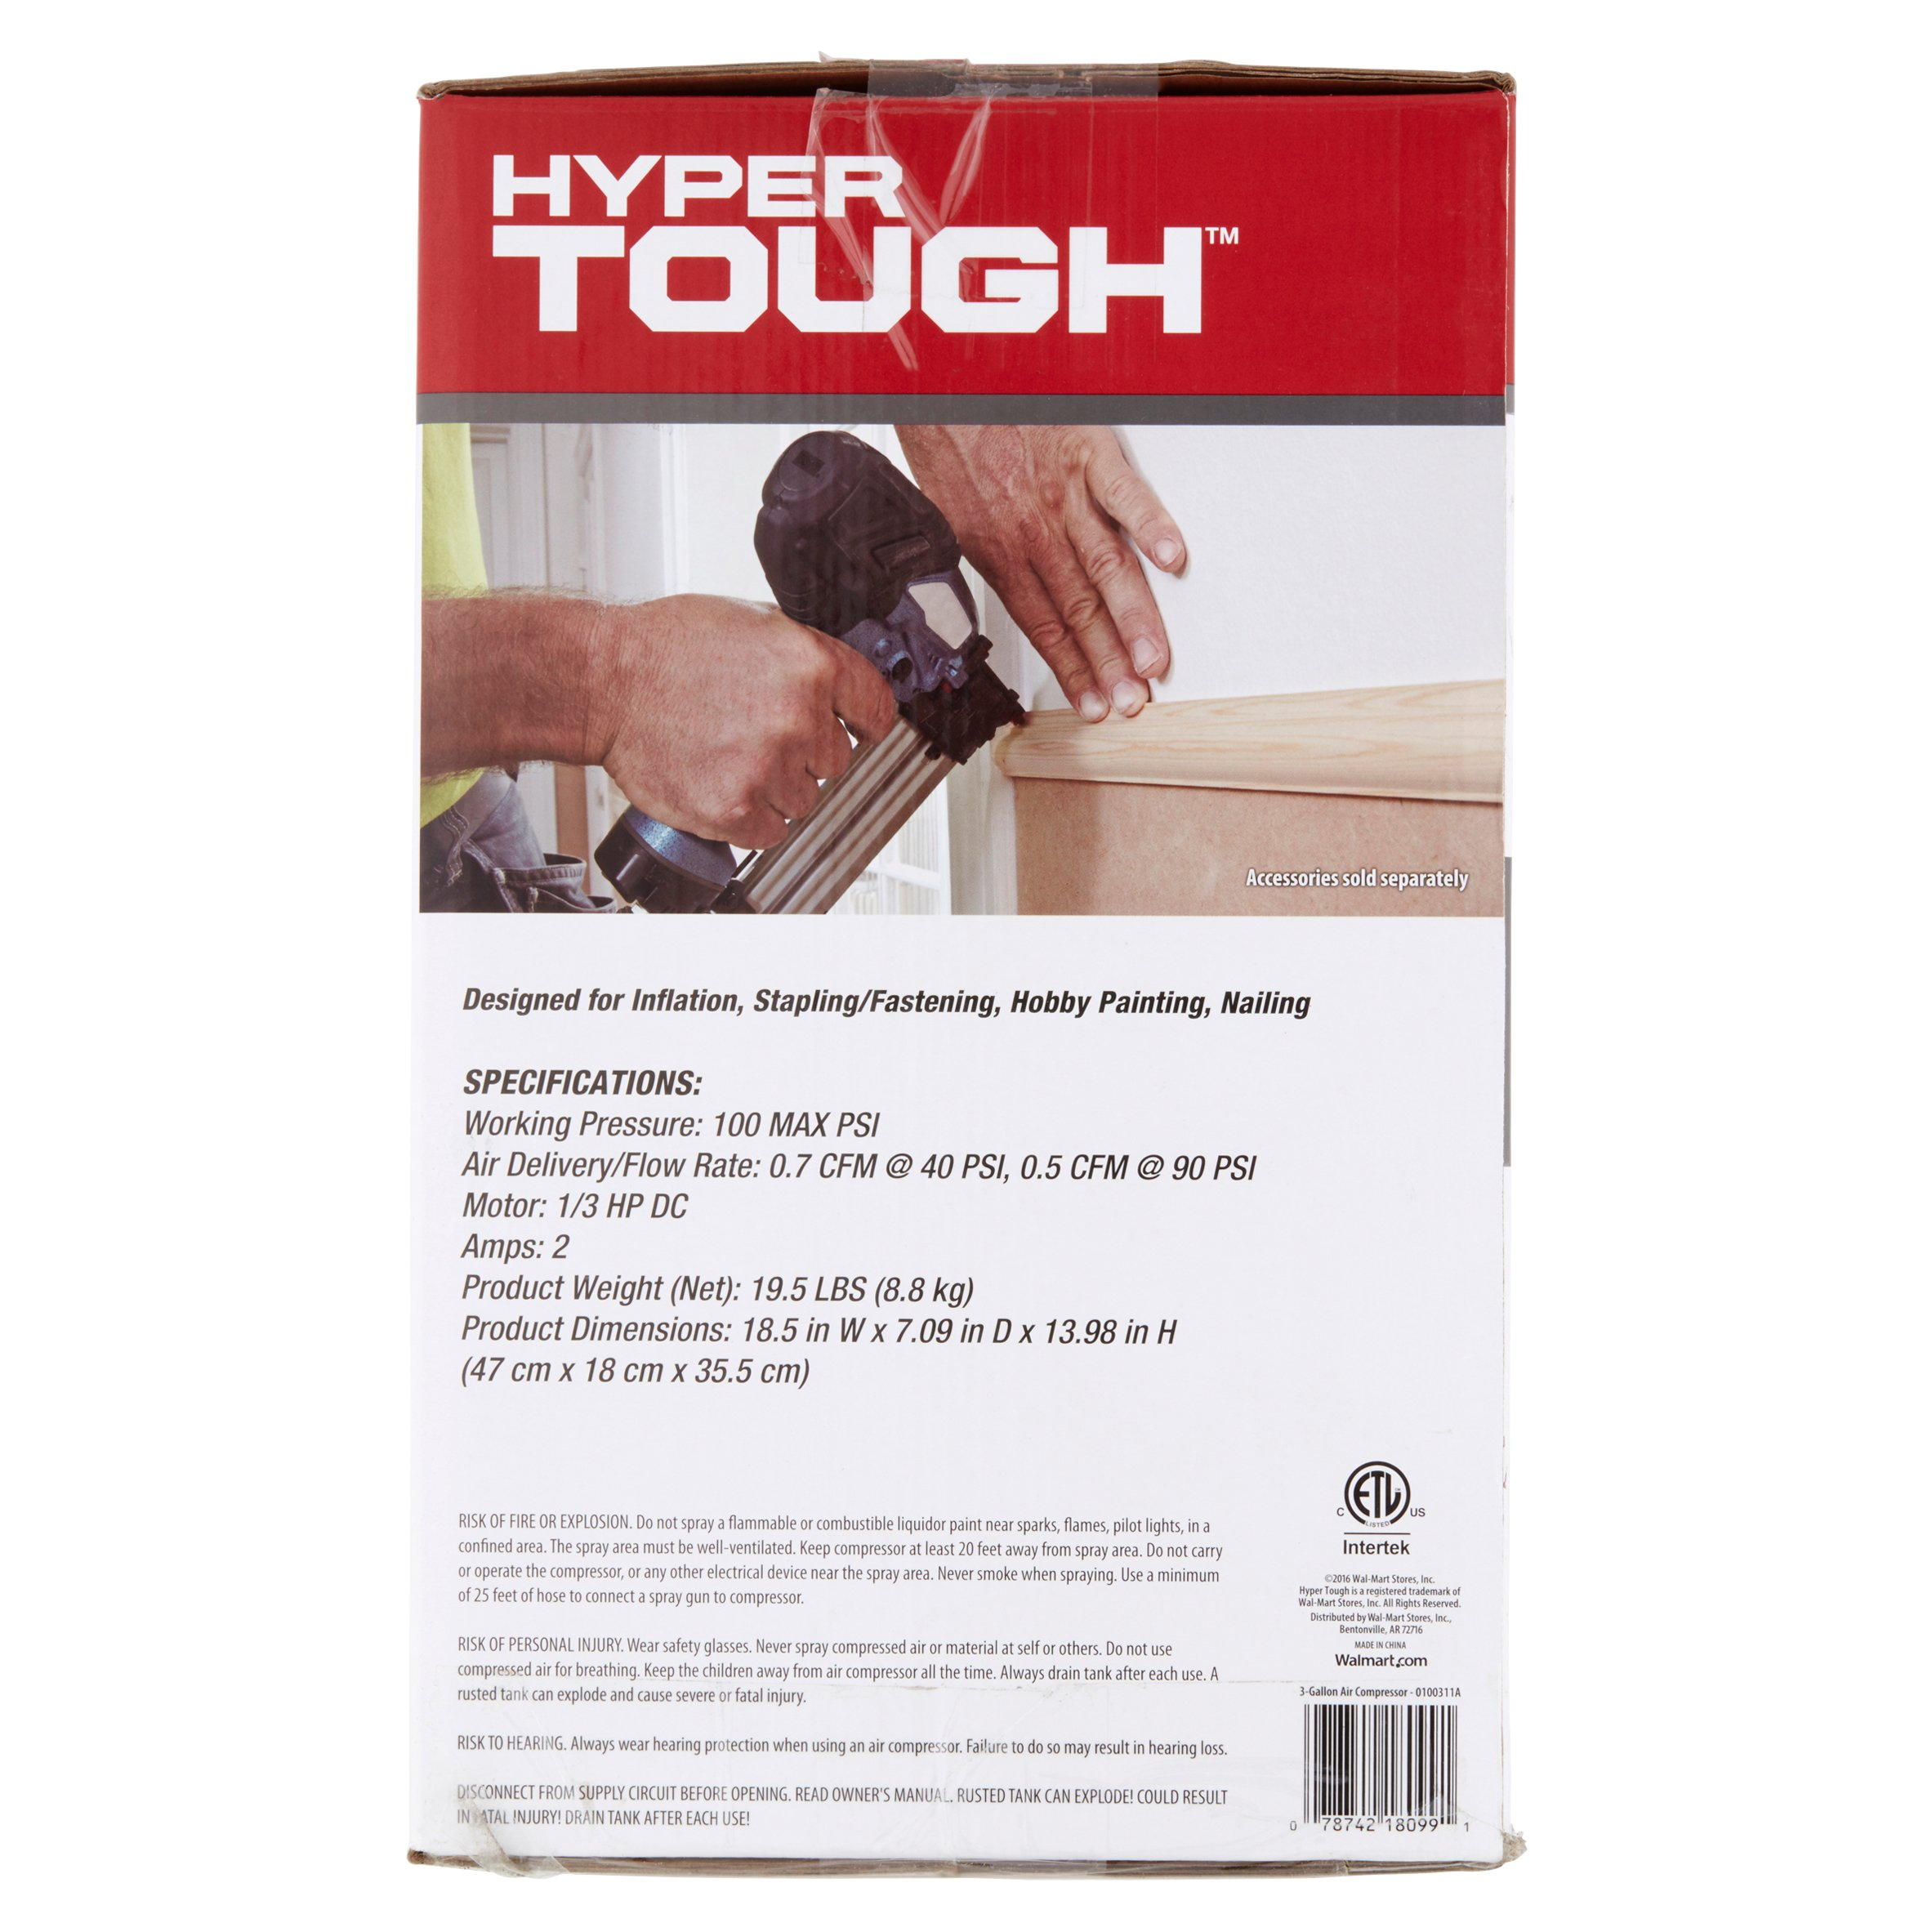 Hyper Tough 3 Gallon Air Compressor Wire Run List And Control Circuits Cont Figure 7